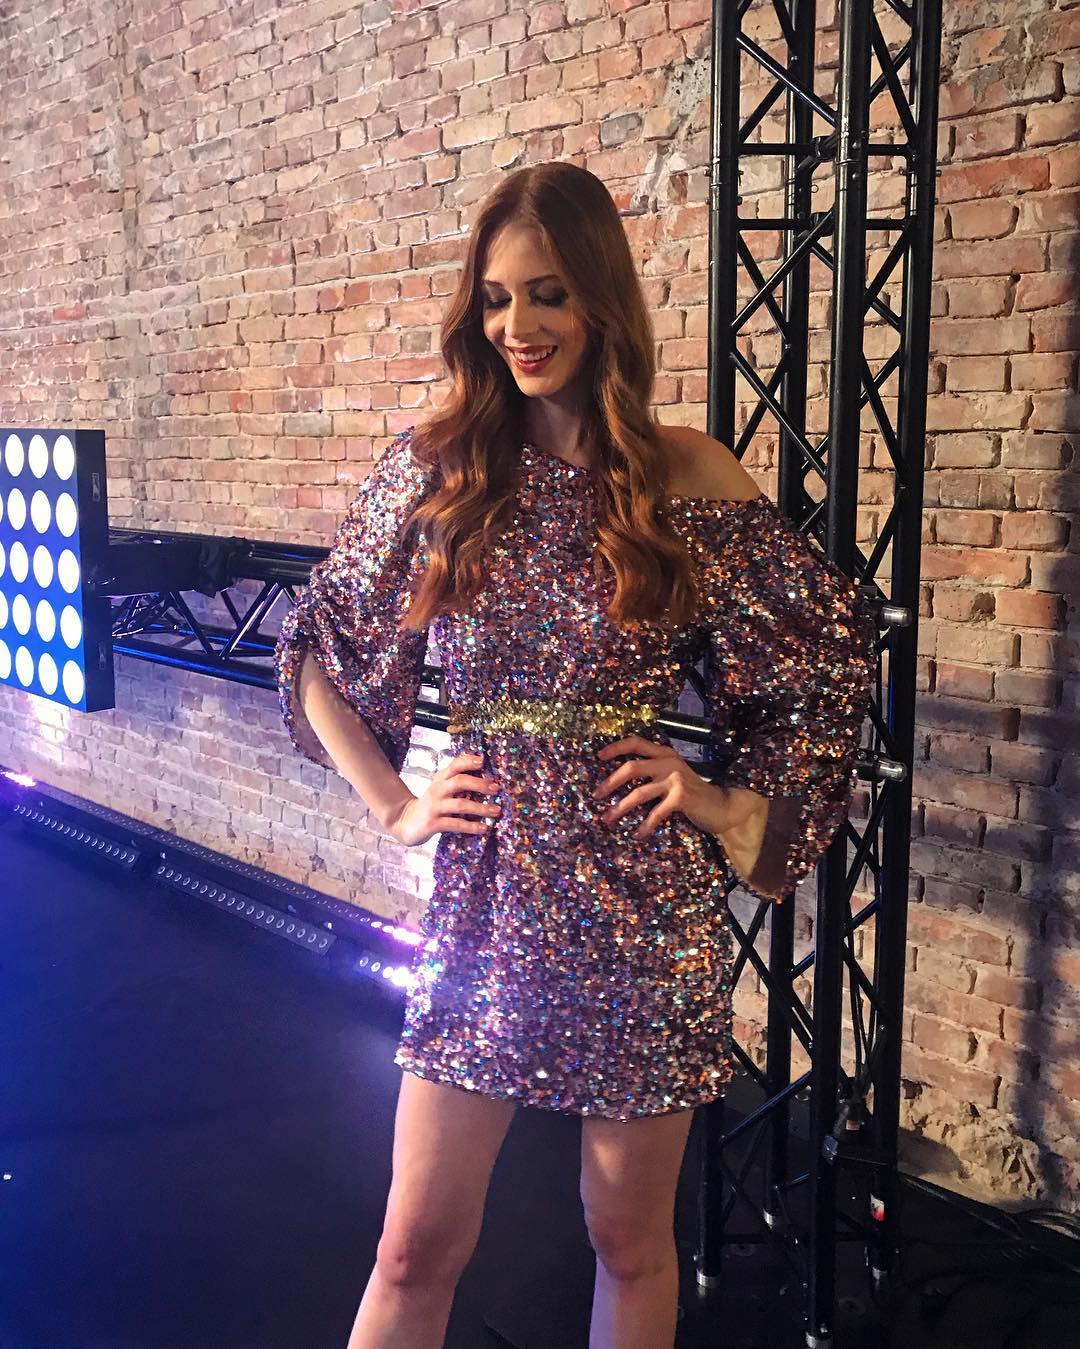 candidatas a miss slovensko 2019. final: 27 de abril. - Página 5 5zbv88q3